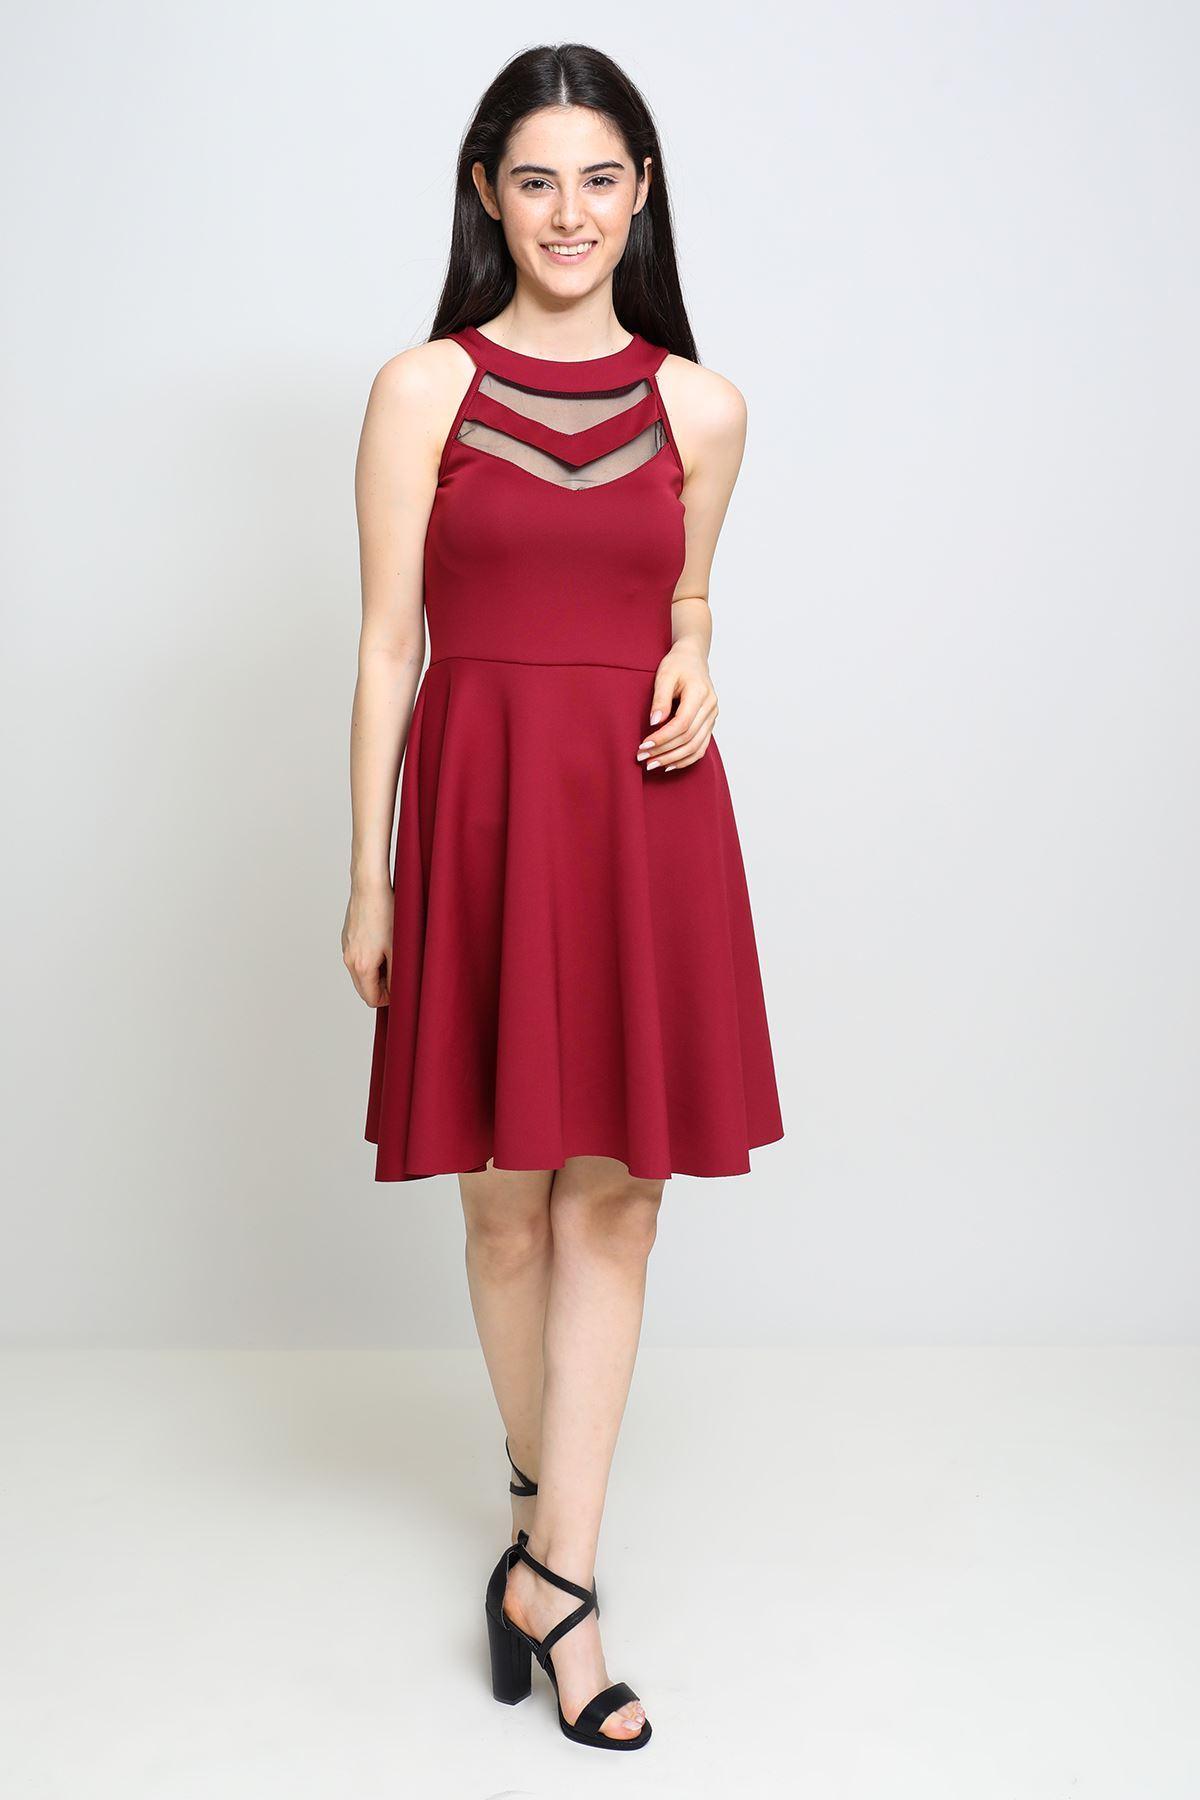 Göğsü Tül Detaylı Floş Elbise